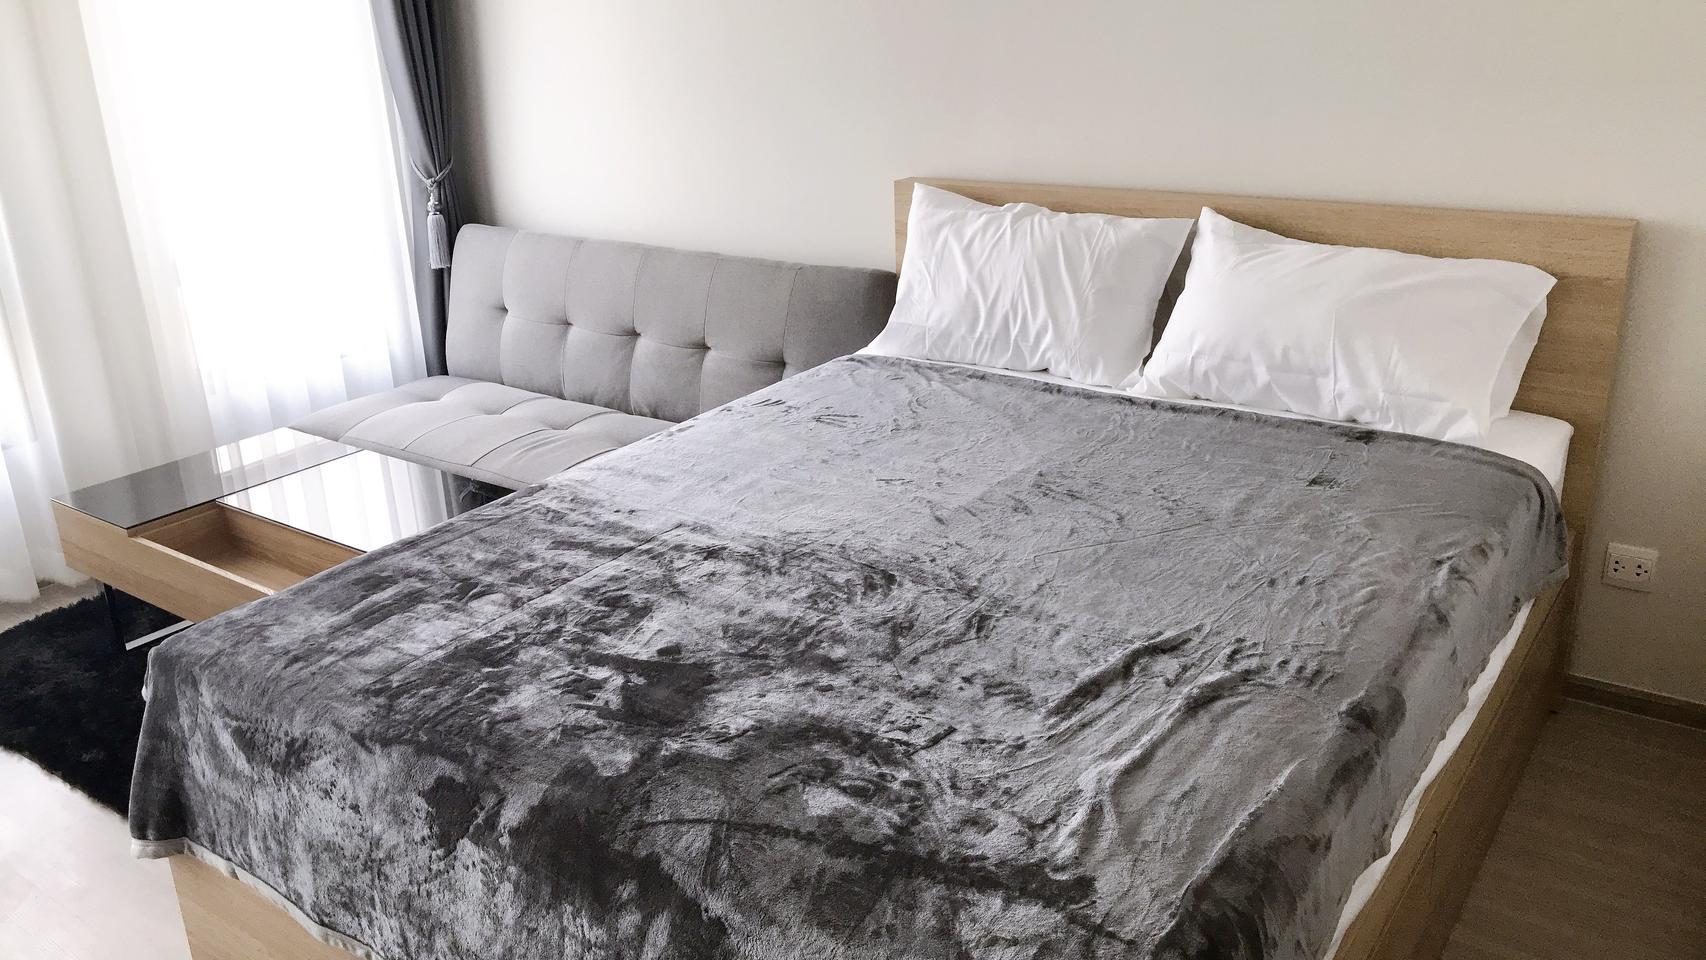 Fully furnished For rent ให้เช่า ฿12,000 ห้อง 25 ตร.ม. 8F ใหม่พร้อมอยู่ Aspire อโศก-รัชดา **รับ Agent รูปที่ 6